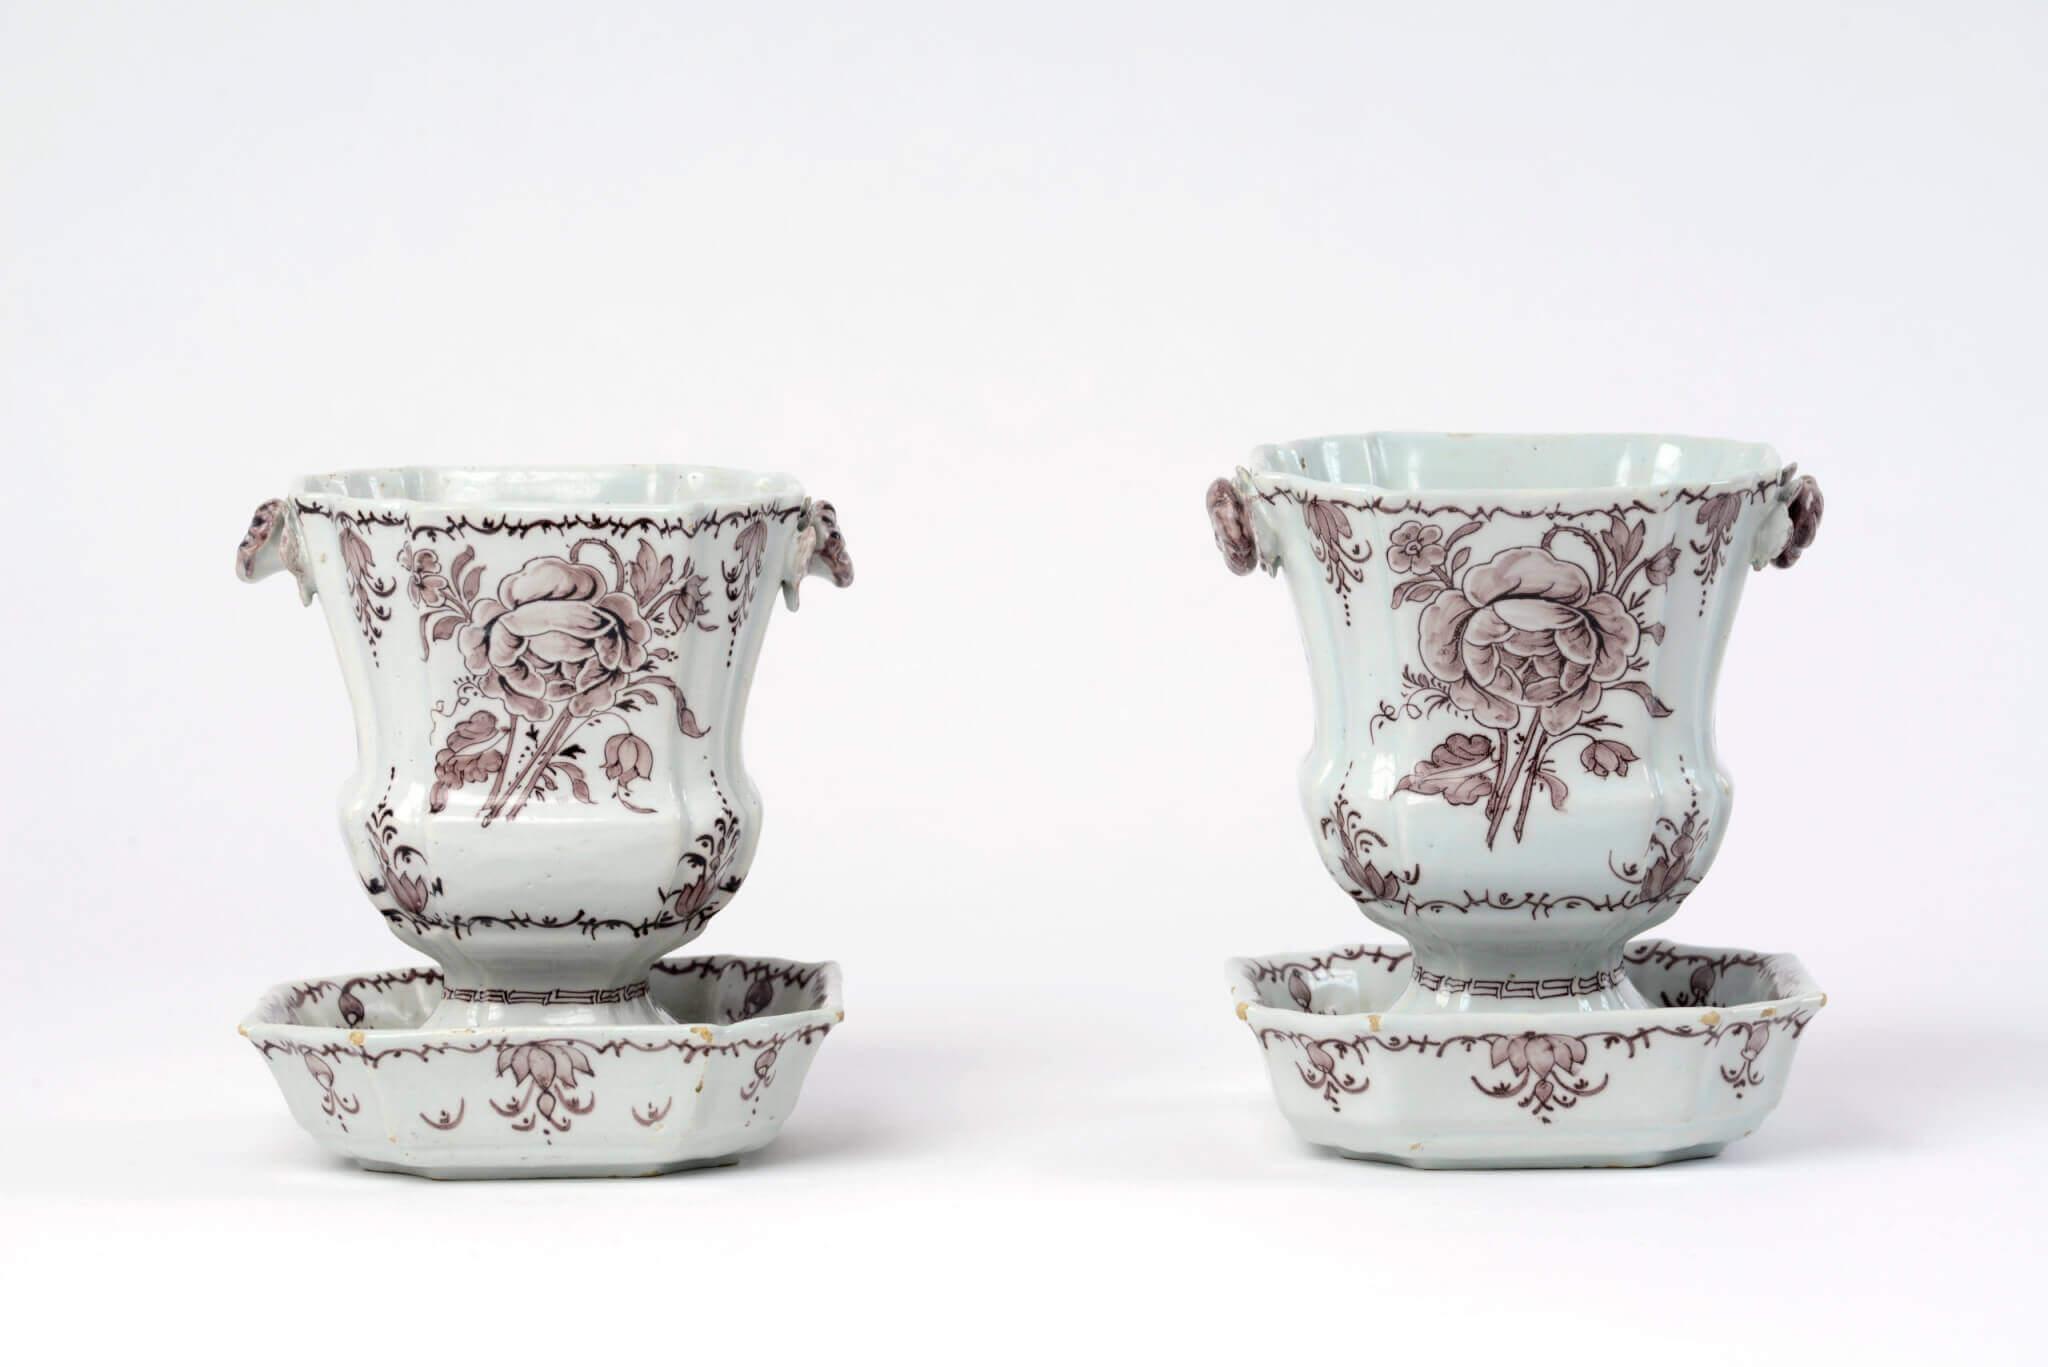 Manganese Delftware jardinières